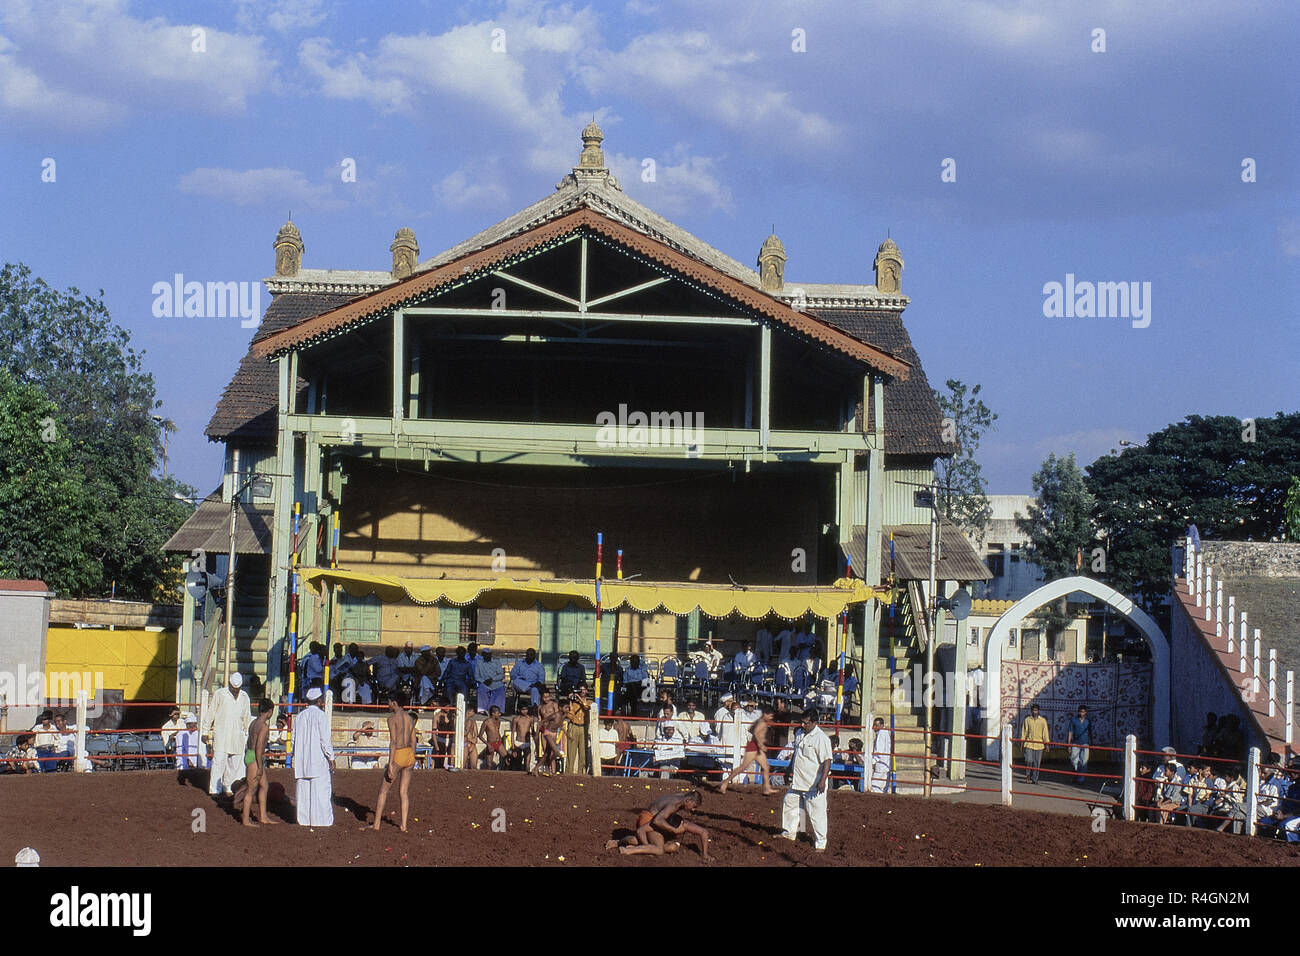 Shahu Khasbag wrestling arena, Palace Theatre, Kolhapur, Maharashtra, India, Asia Immagini Stock